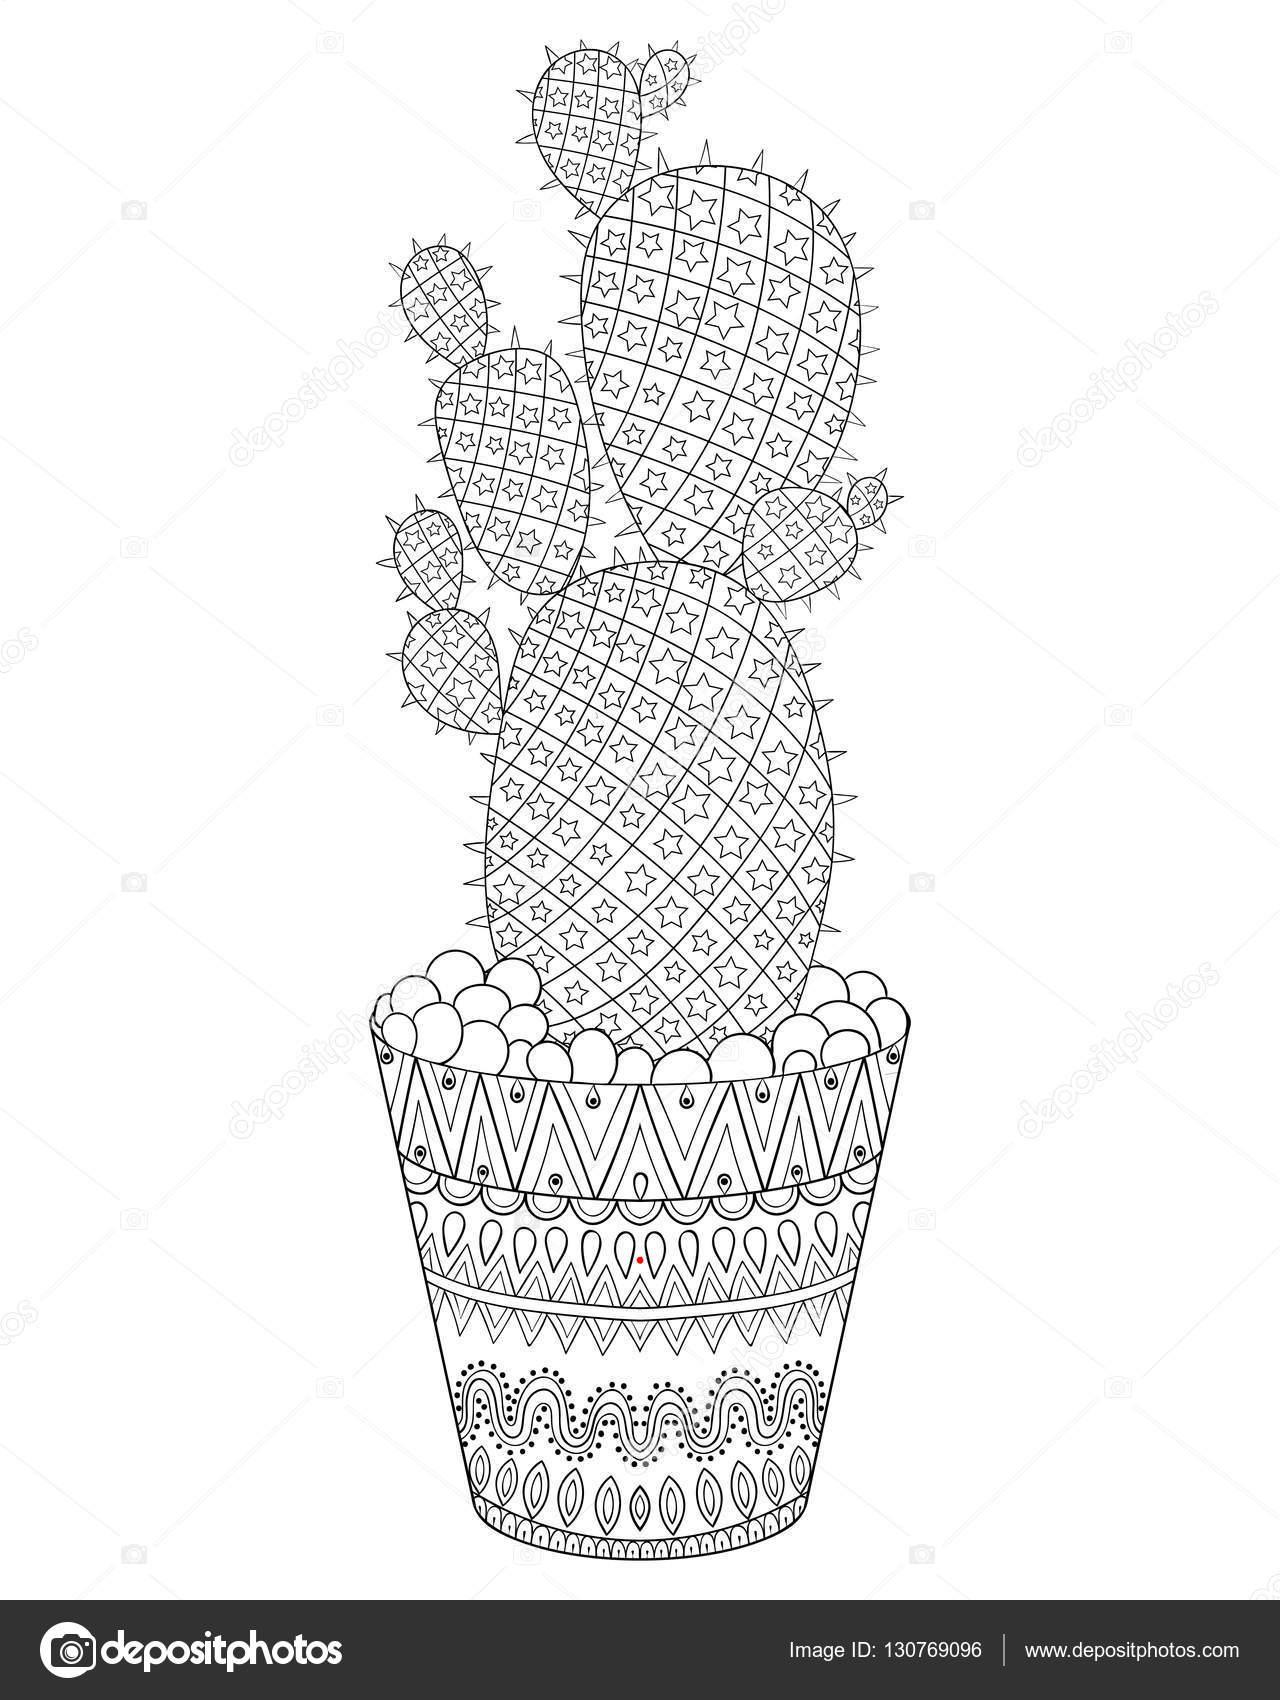 Zentangle Kaktüs Vektör çizim çizilmiş Anahat çöl Bitki Doku